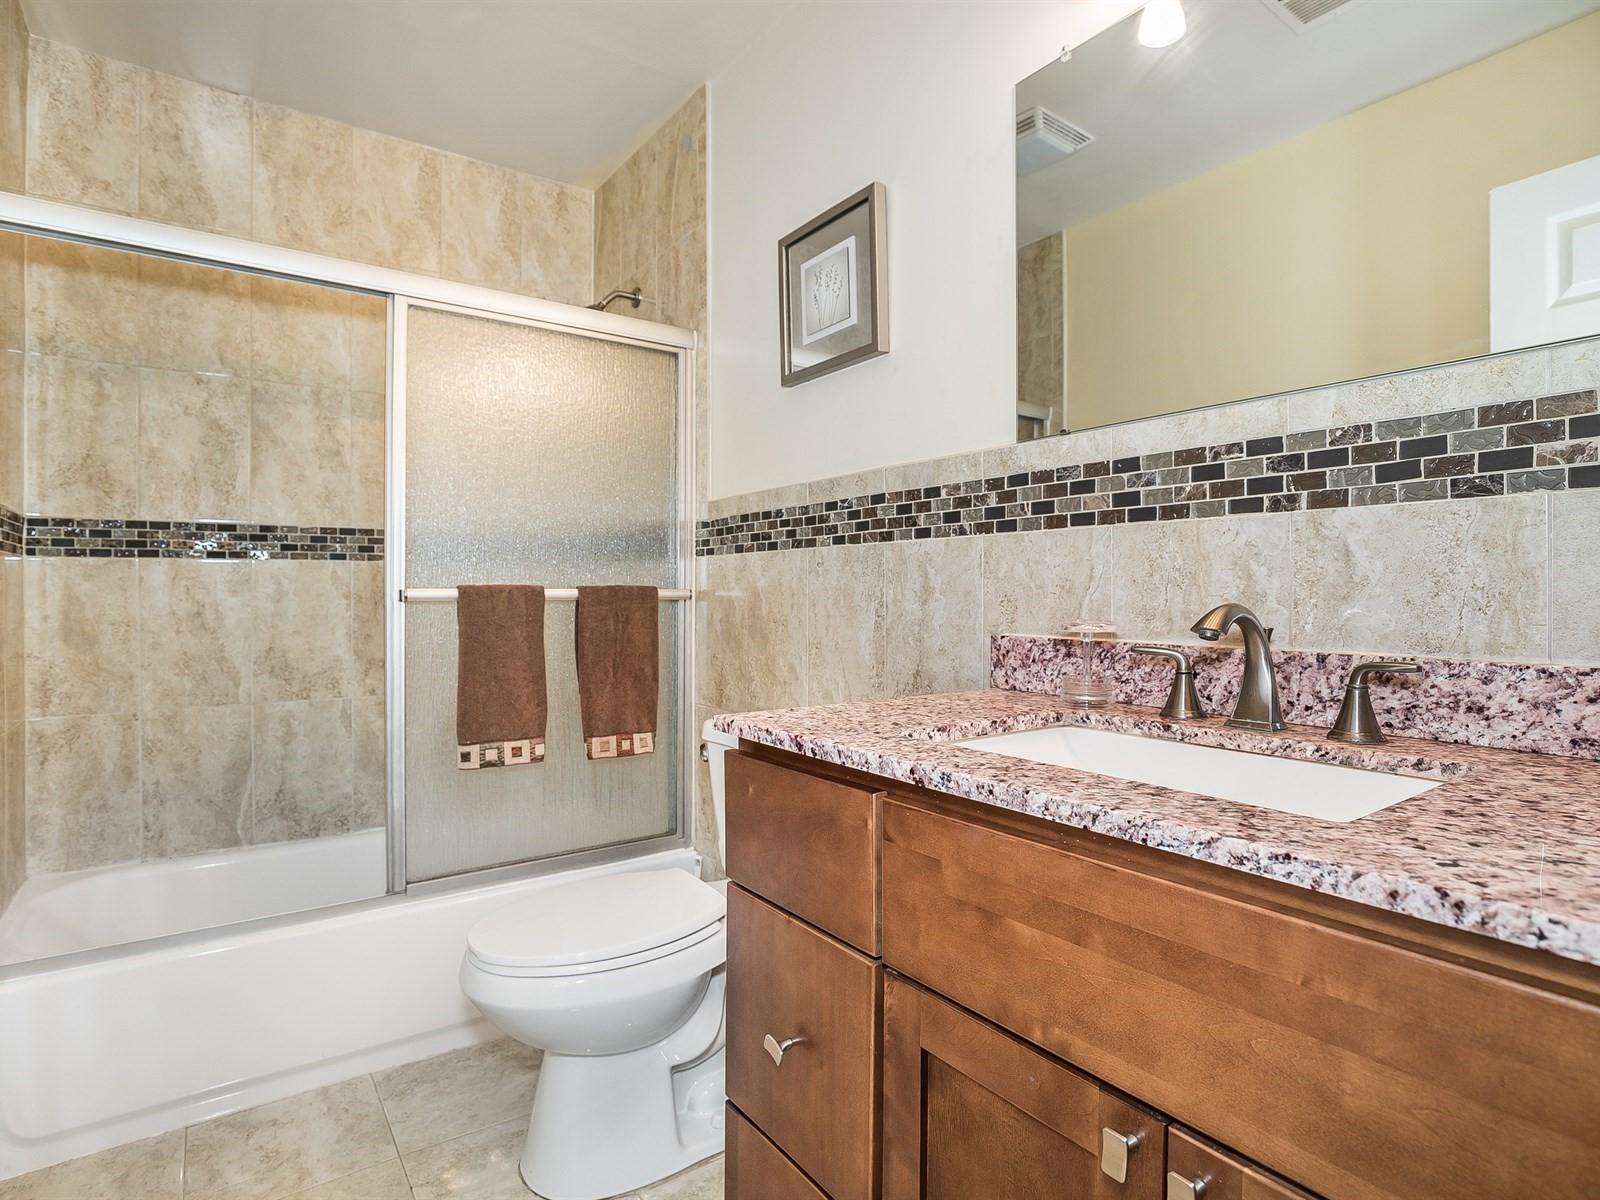 Woodbridge 4 Temporary Housing bathroom